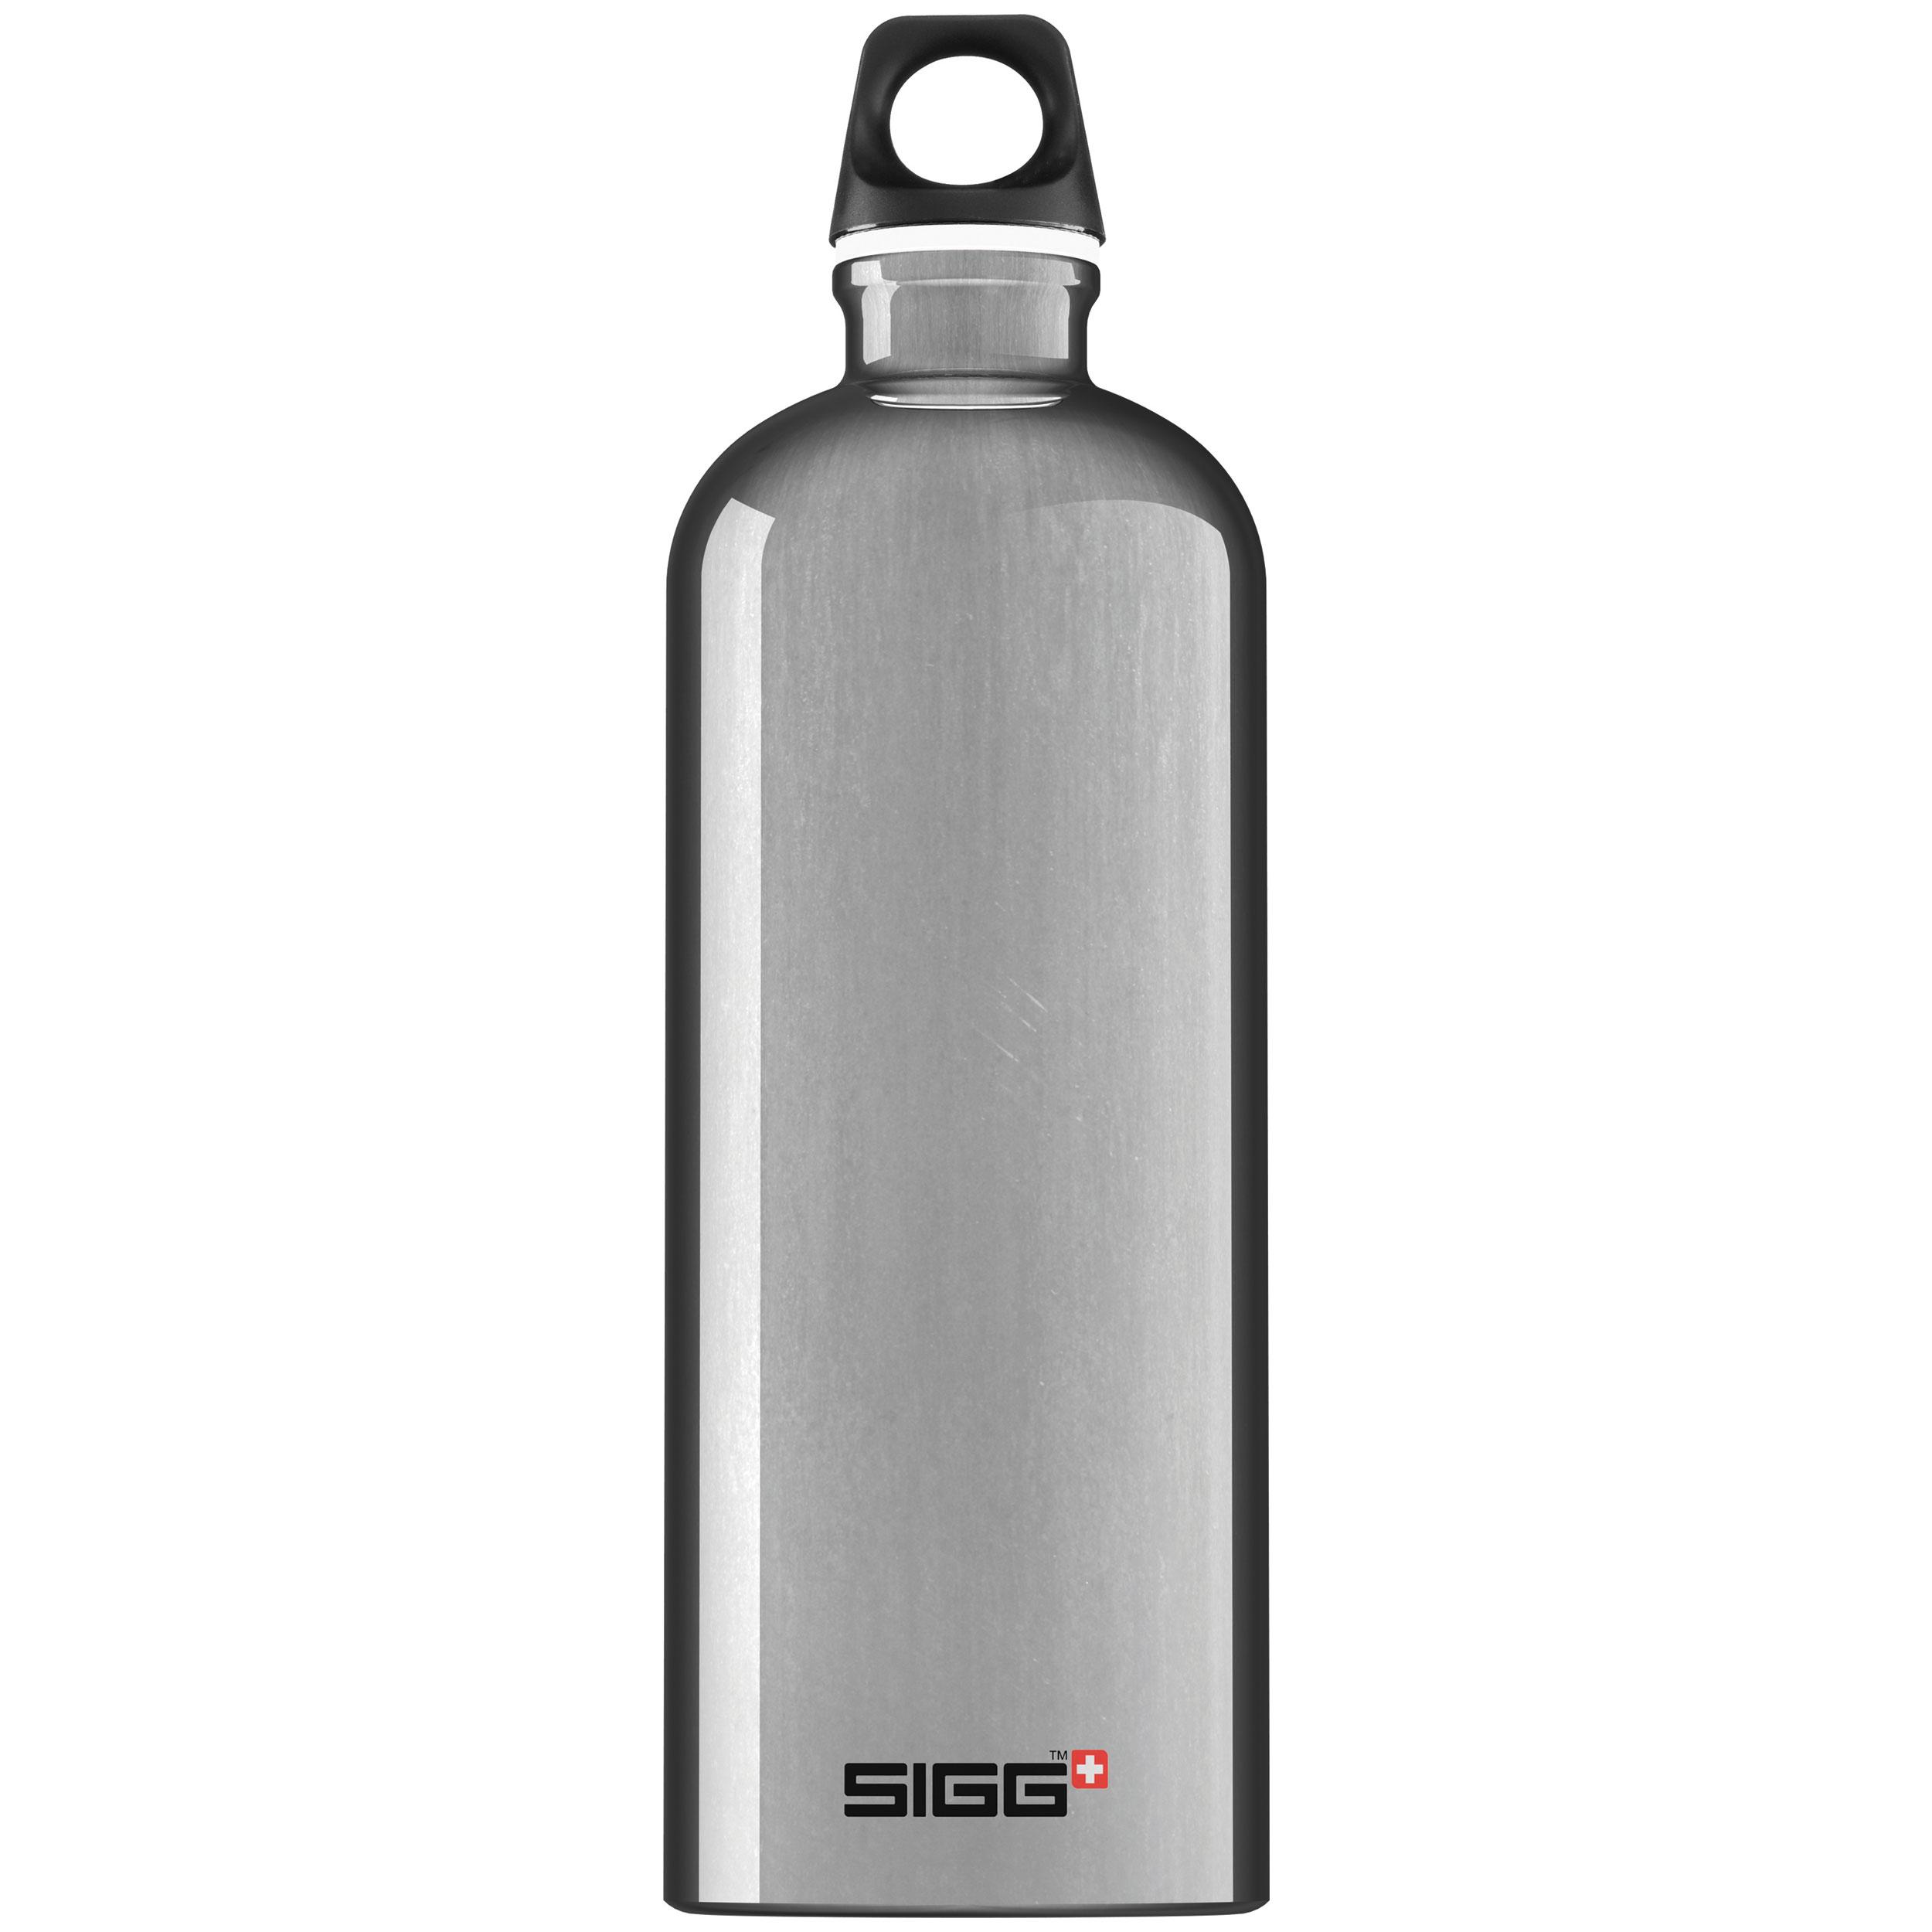 Sigg Drinking Bottle Traveller Alu Aluminium Screw Cap